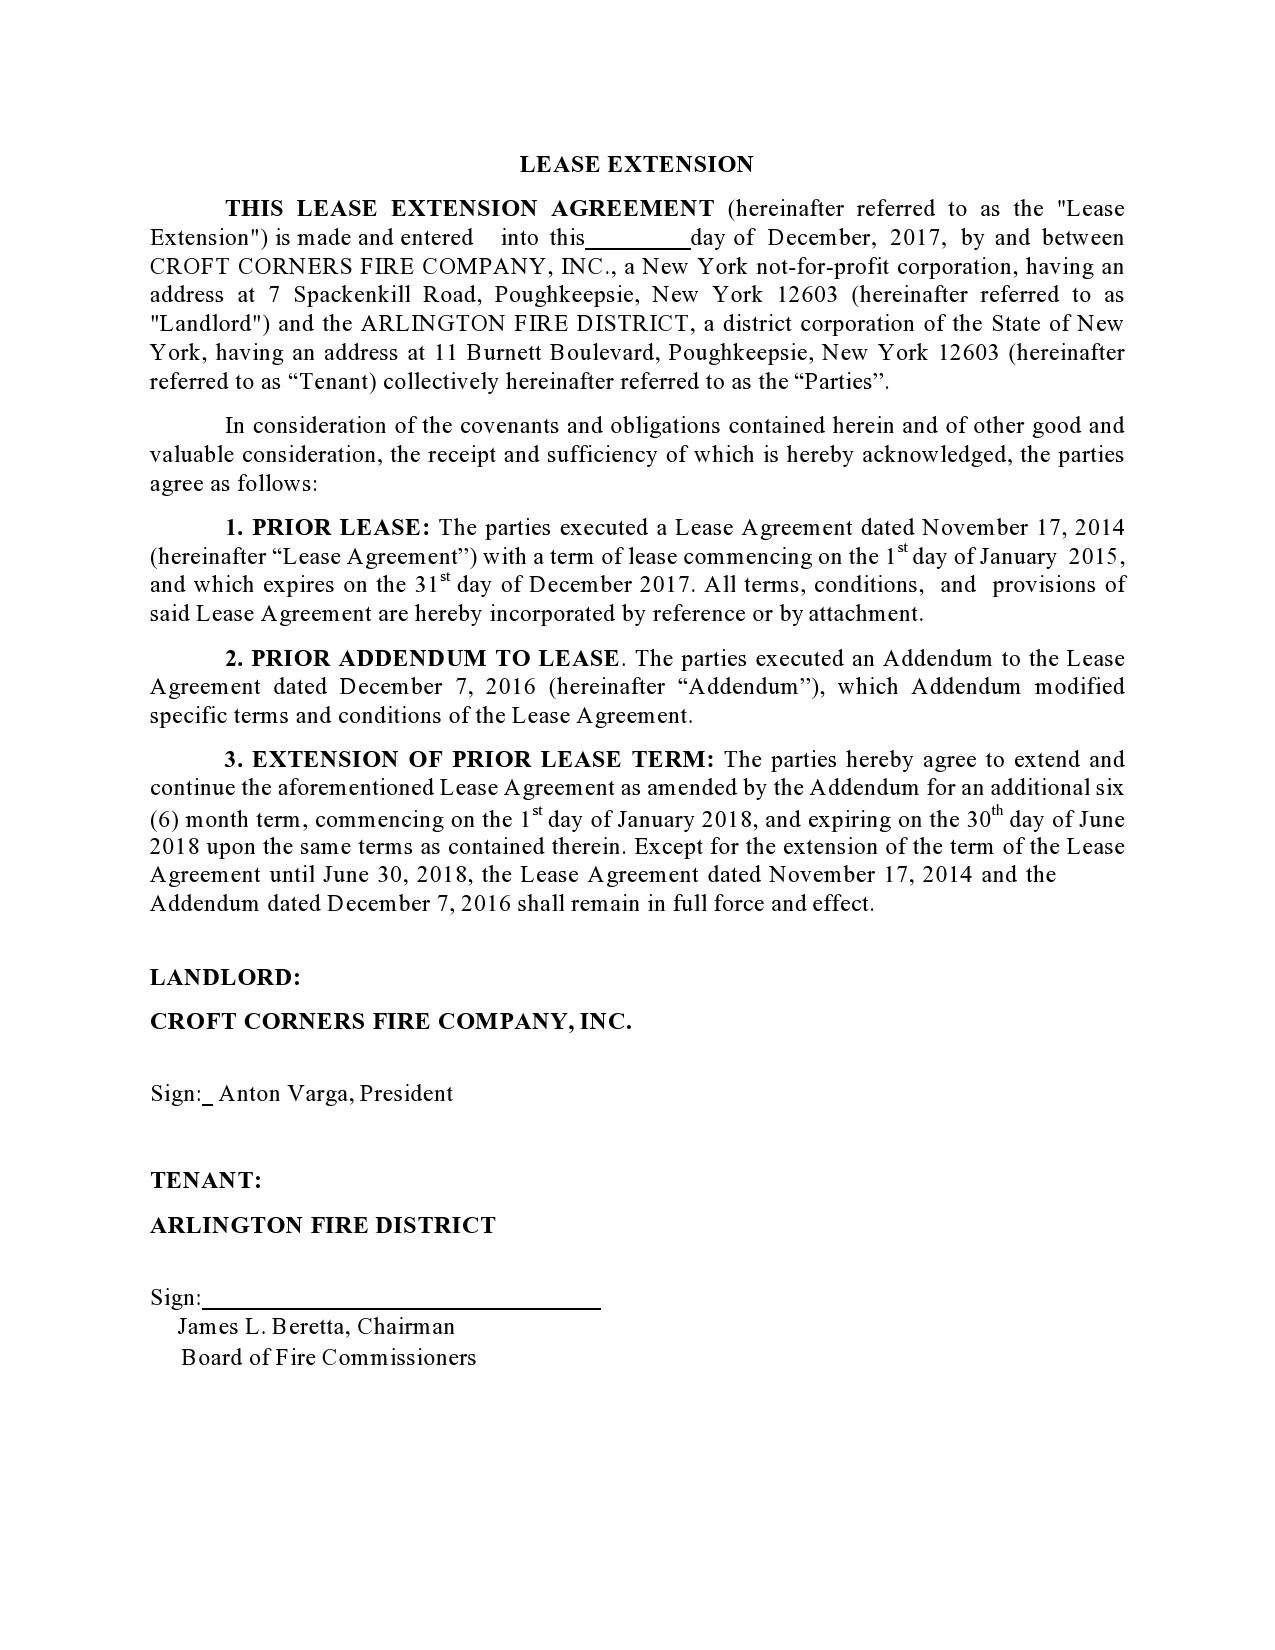 Free lease extension addendum 17